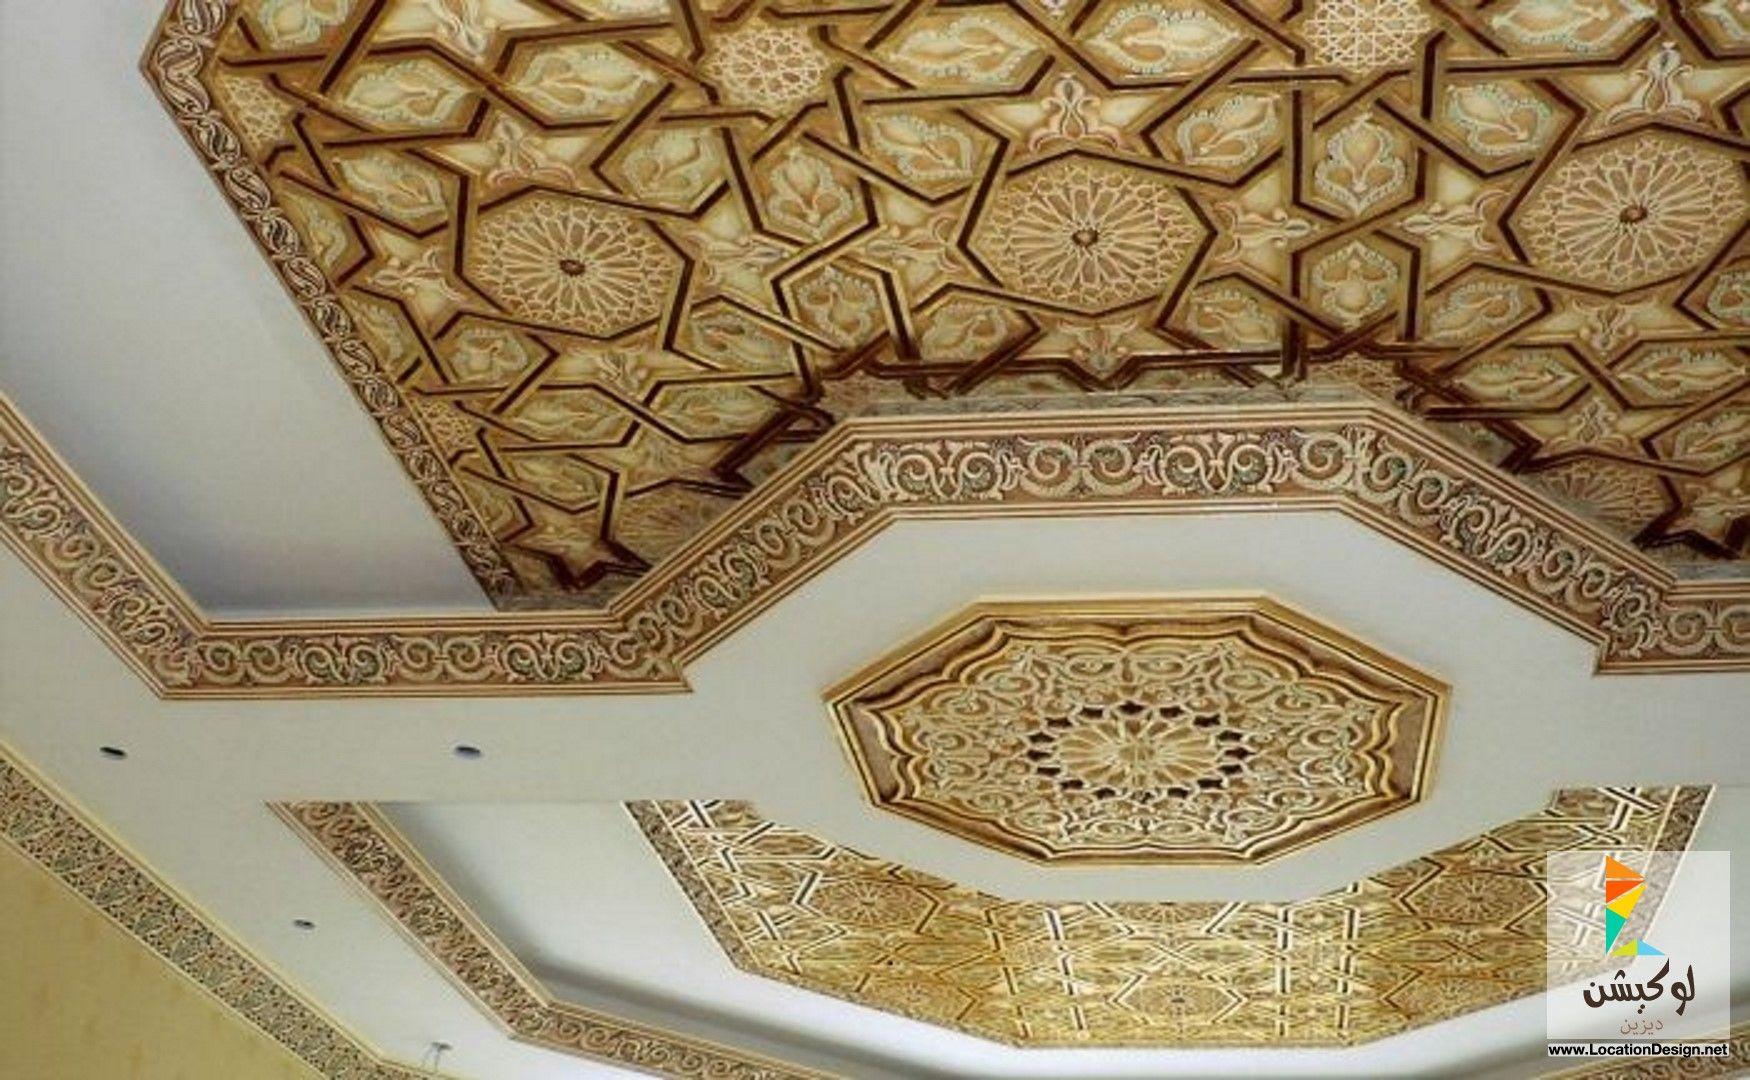 احدث ديكورات جبس مغربي 2015 لوكيشن ديزاين تصميمات ديكورات أفكار جديدة مصر Locationdesign Com Gypsum Decoration Ceiling Design Luxury Ceiling Design